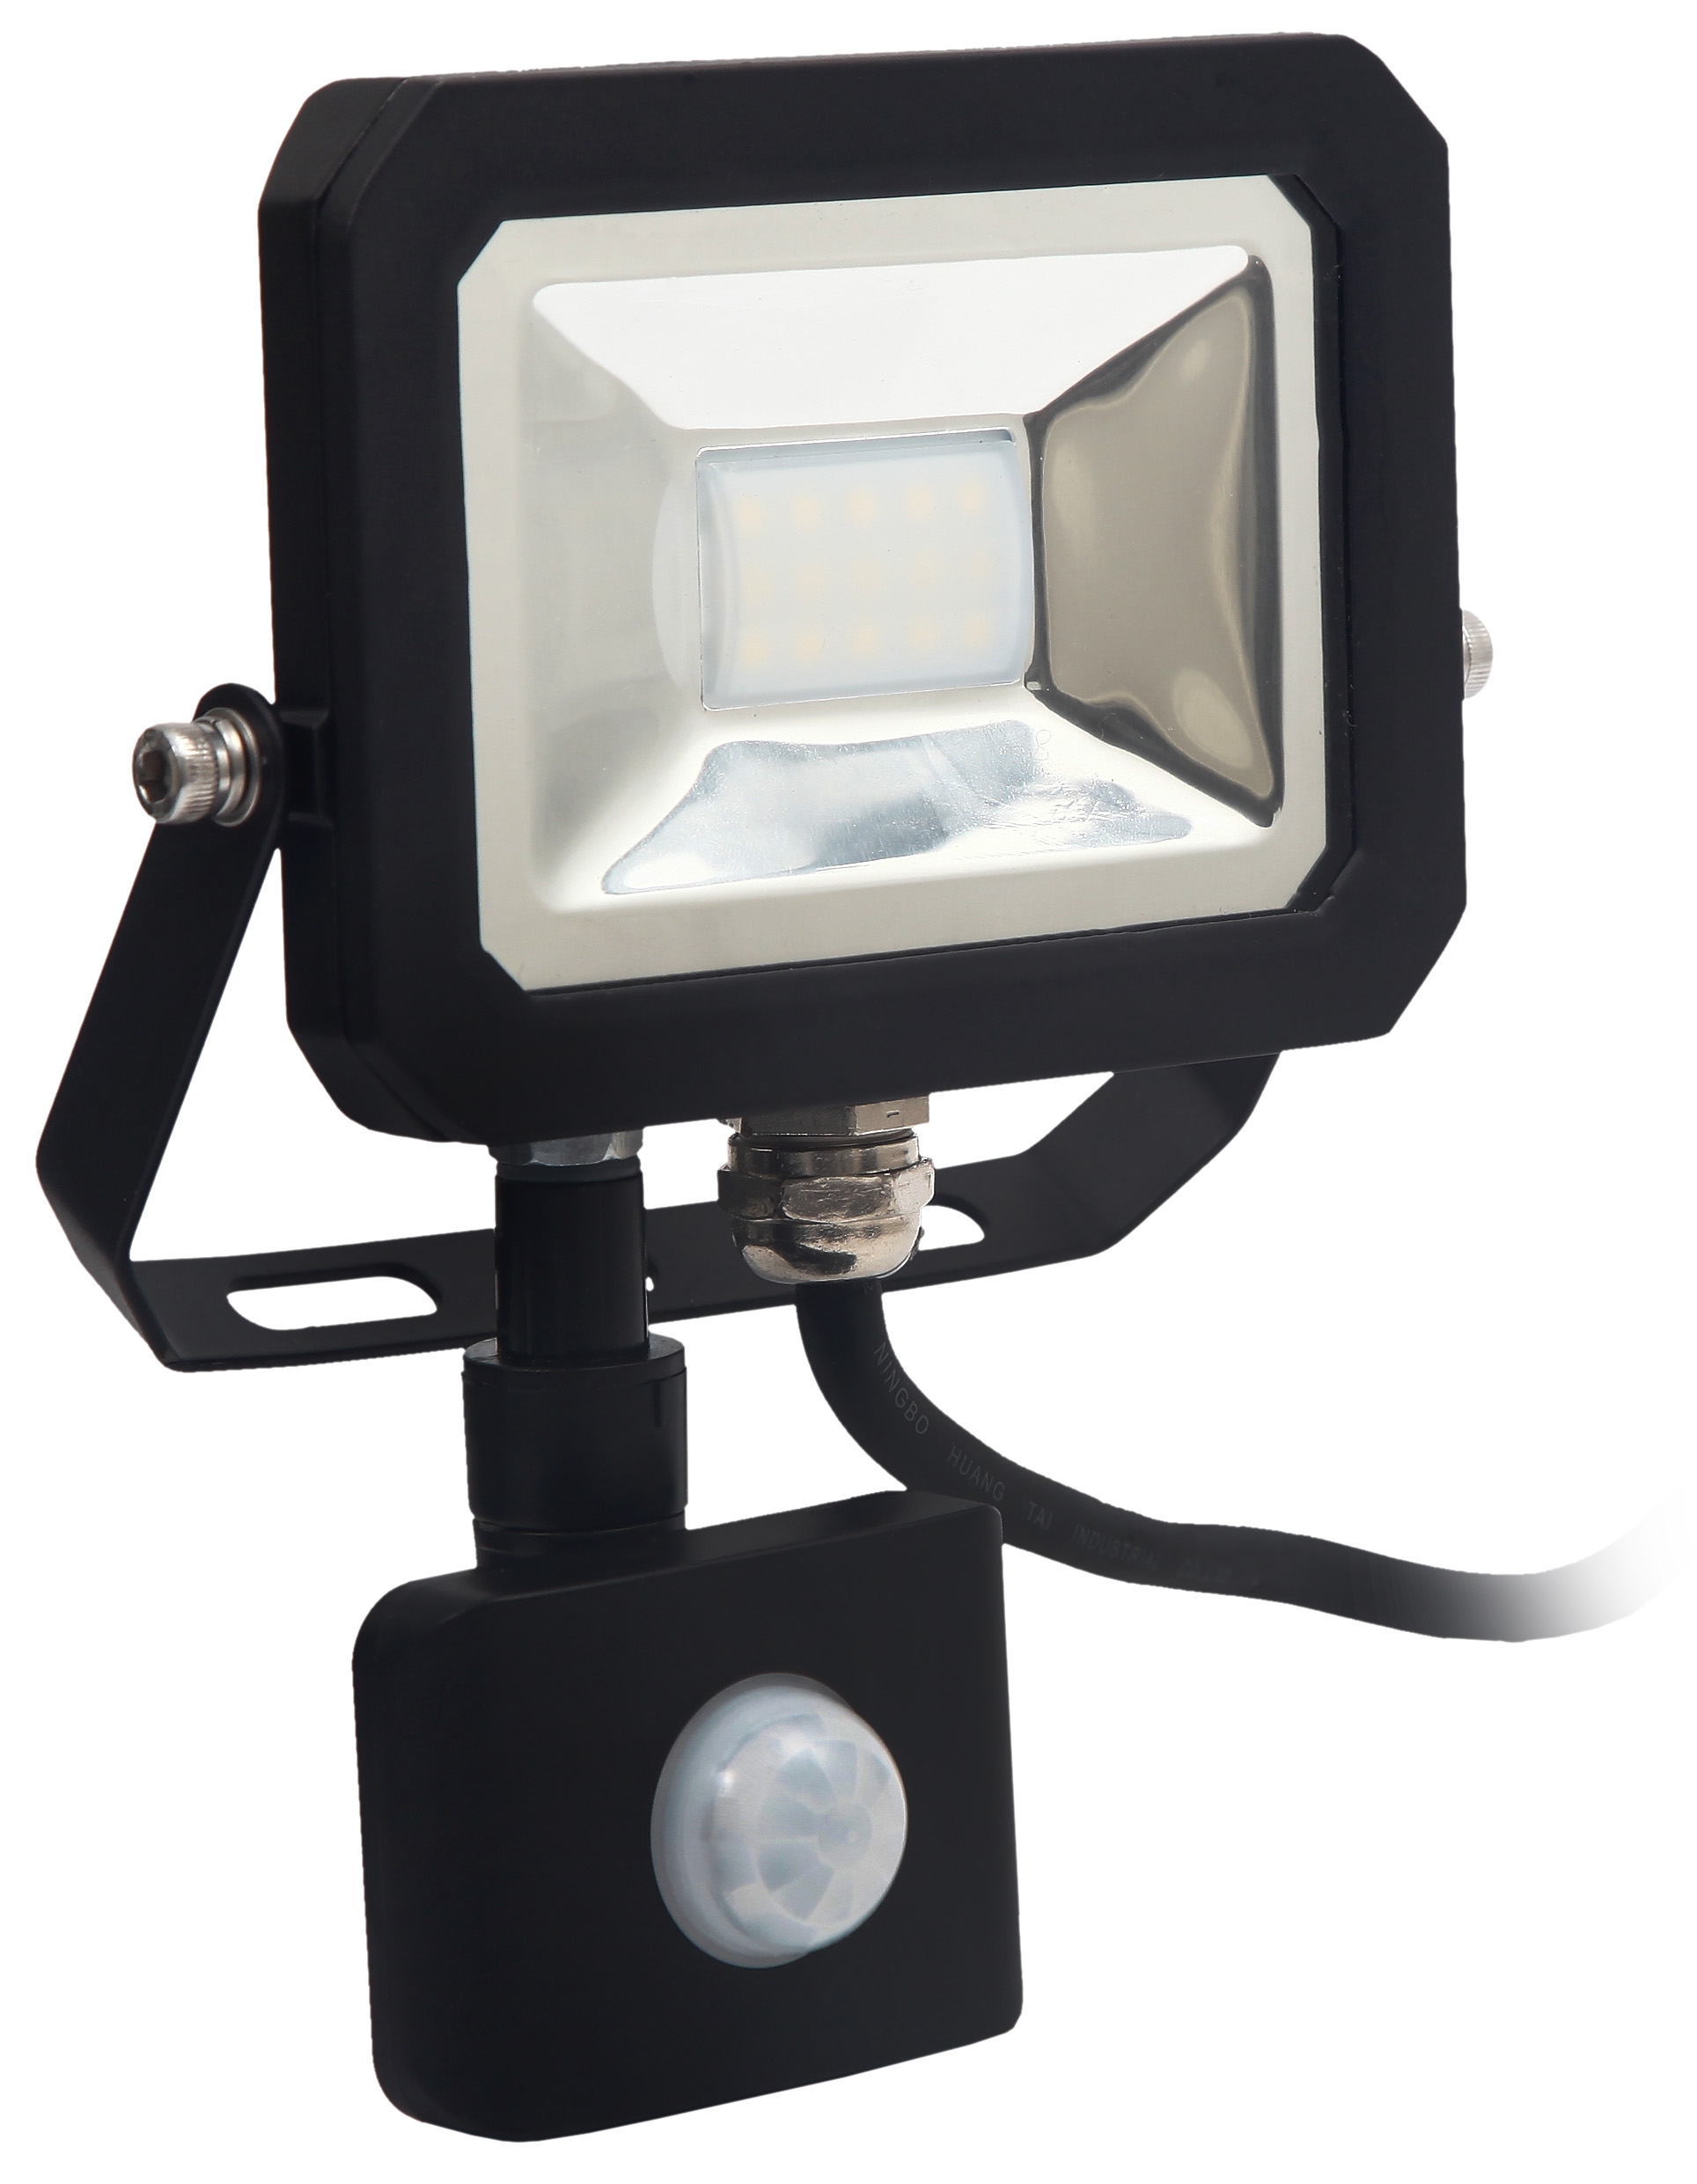 LED reflektory s čidlem / senzorem